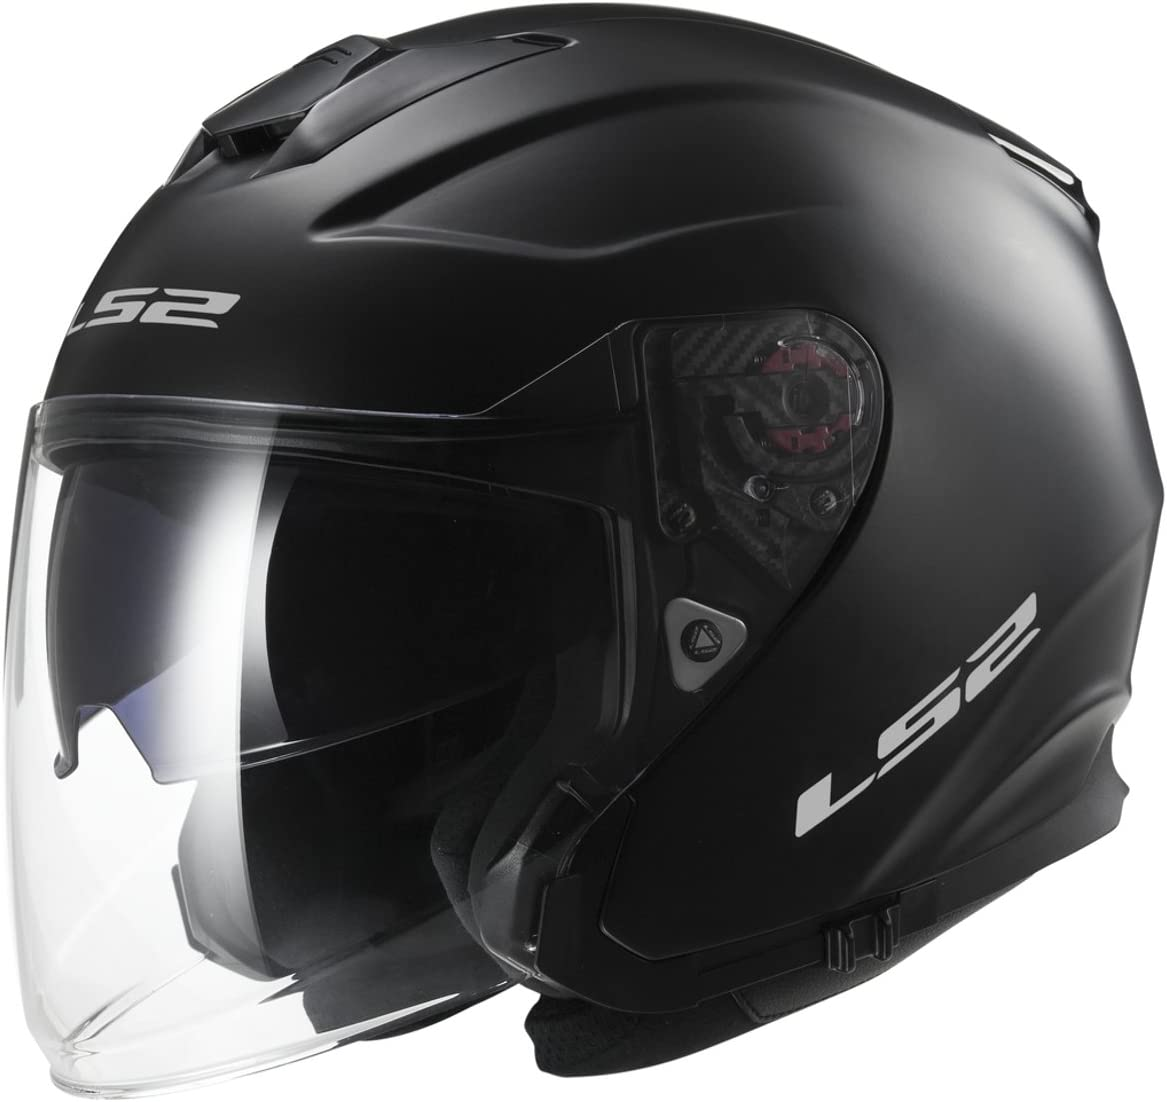 LS2/Helm of521 XXS Matt Black